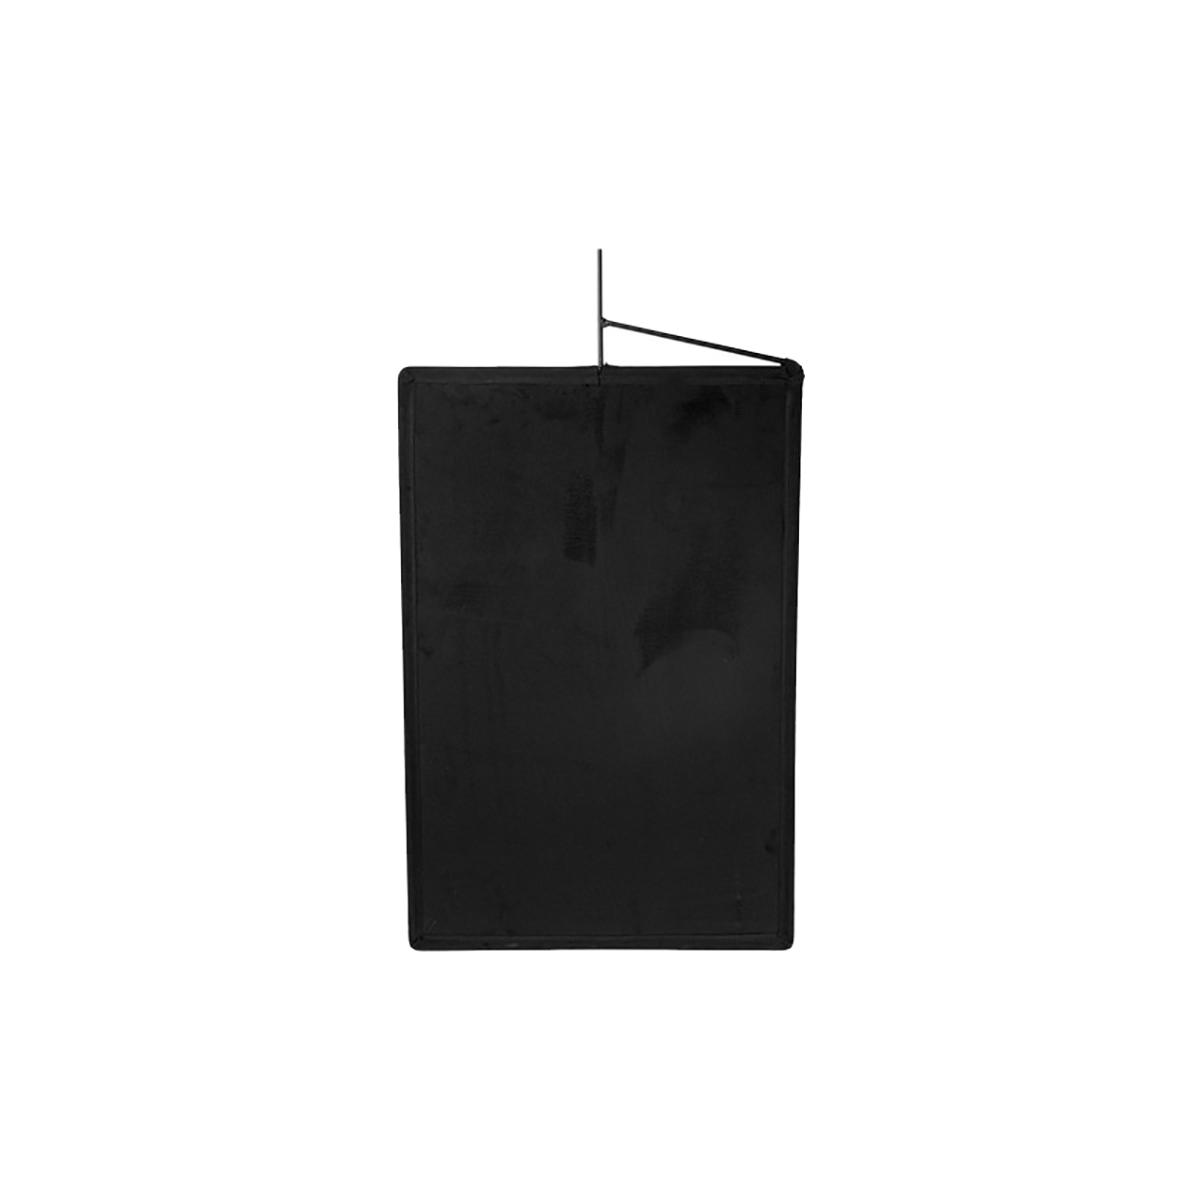 Immagine Bandiera panno nera 120 x 120 cm Floppy